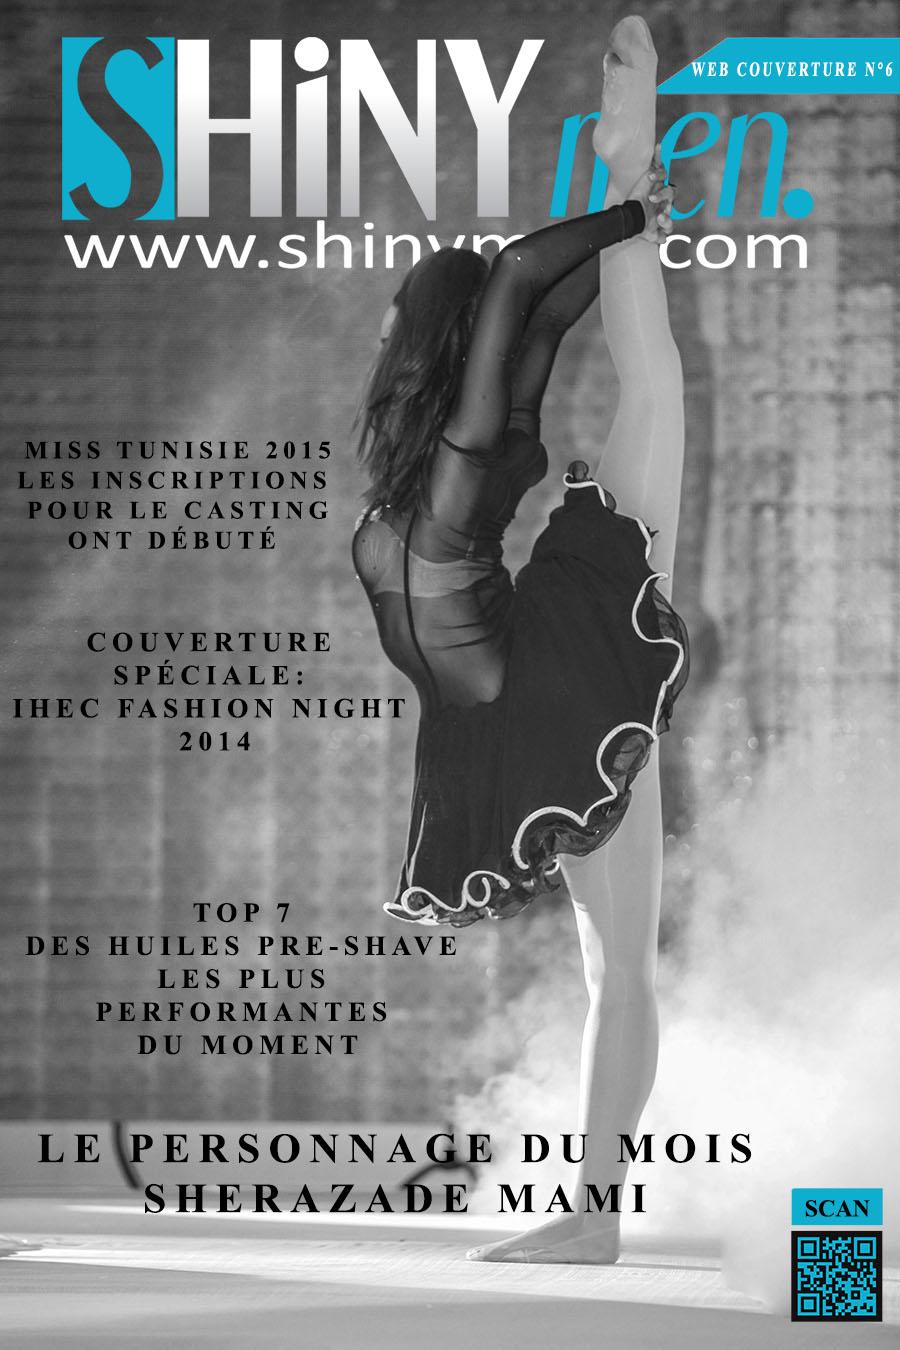 Shinymen-e_cover-Sherazade_Mami-chorégraphe-danseuse-Tunisienne-success_story-couv